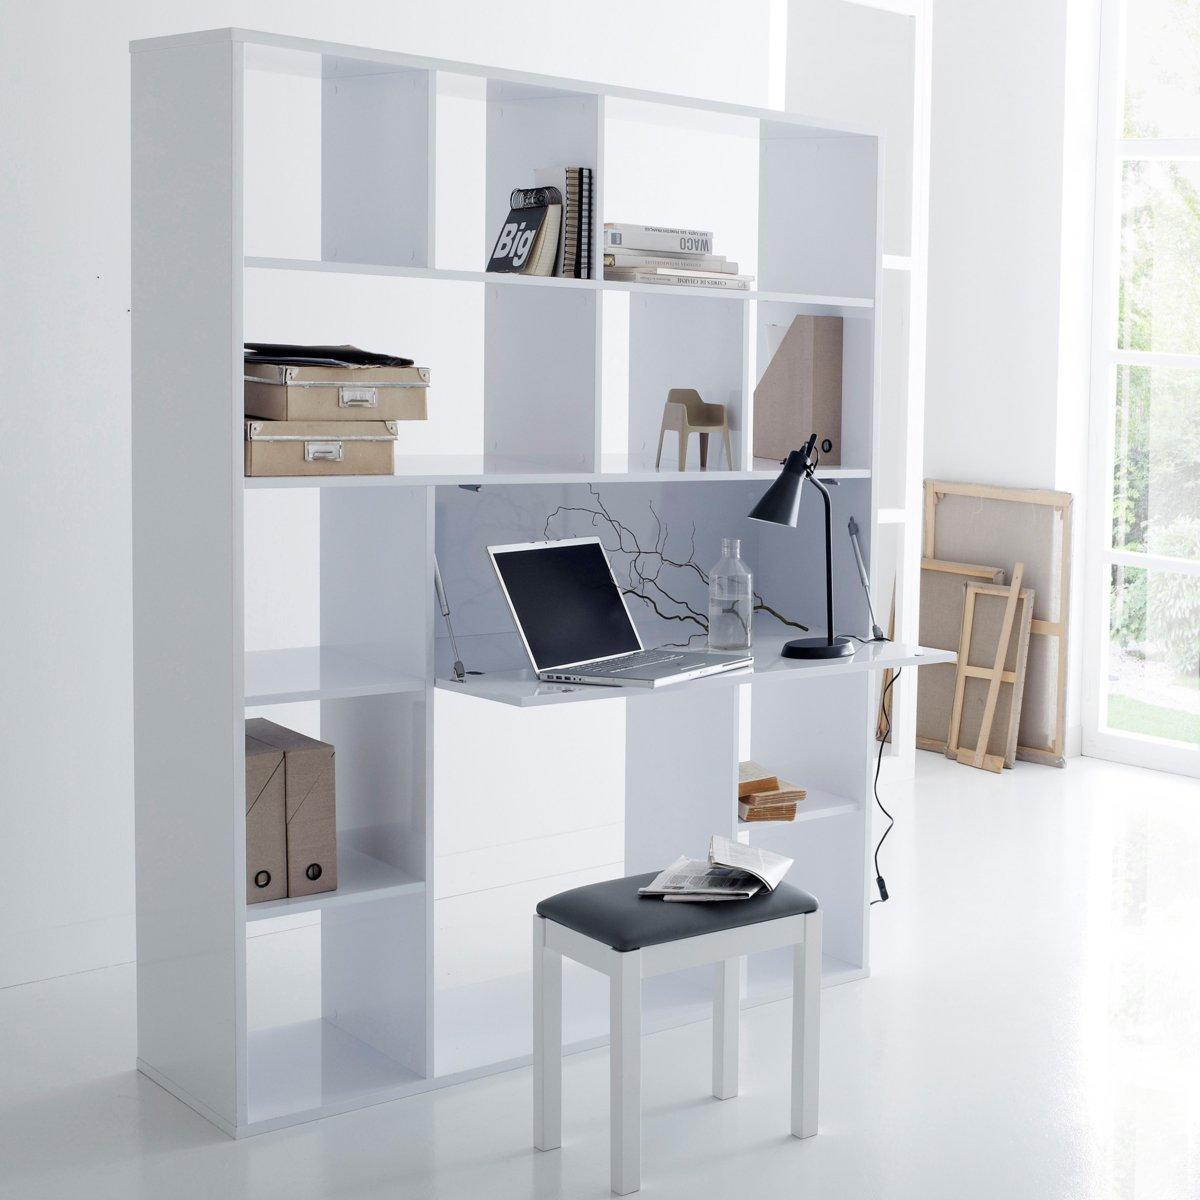 Стол-стеллаж для кабинета